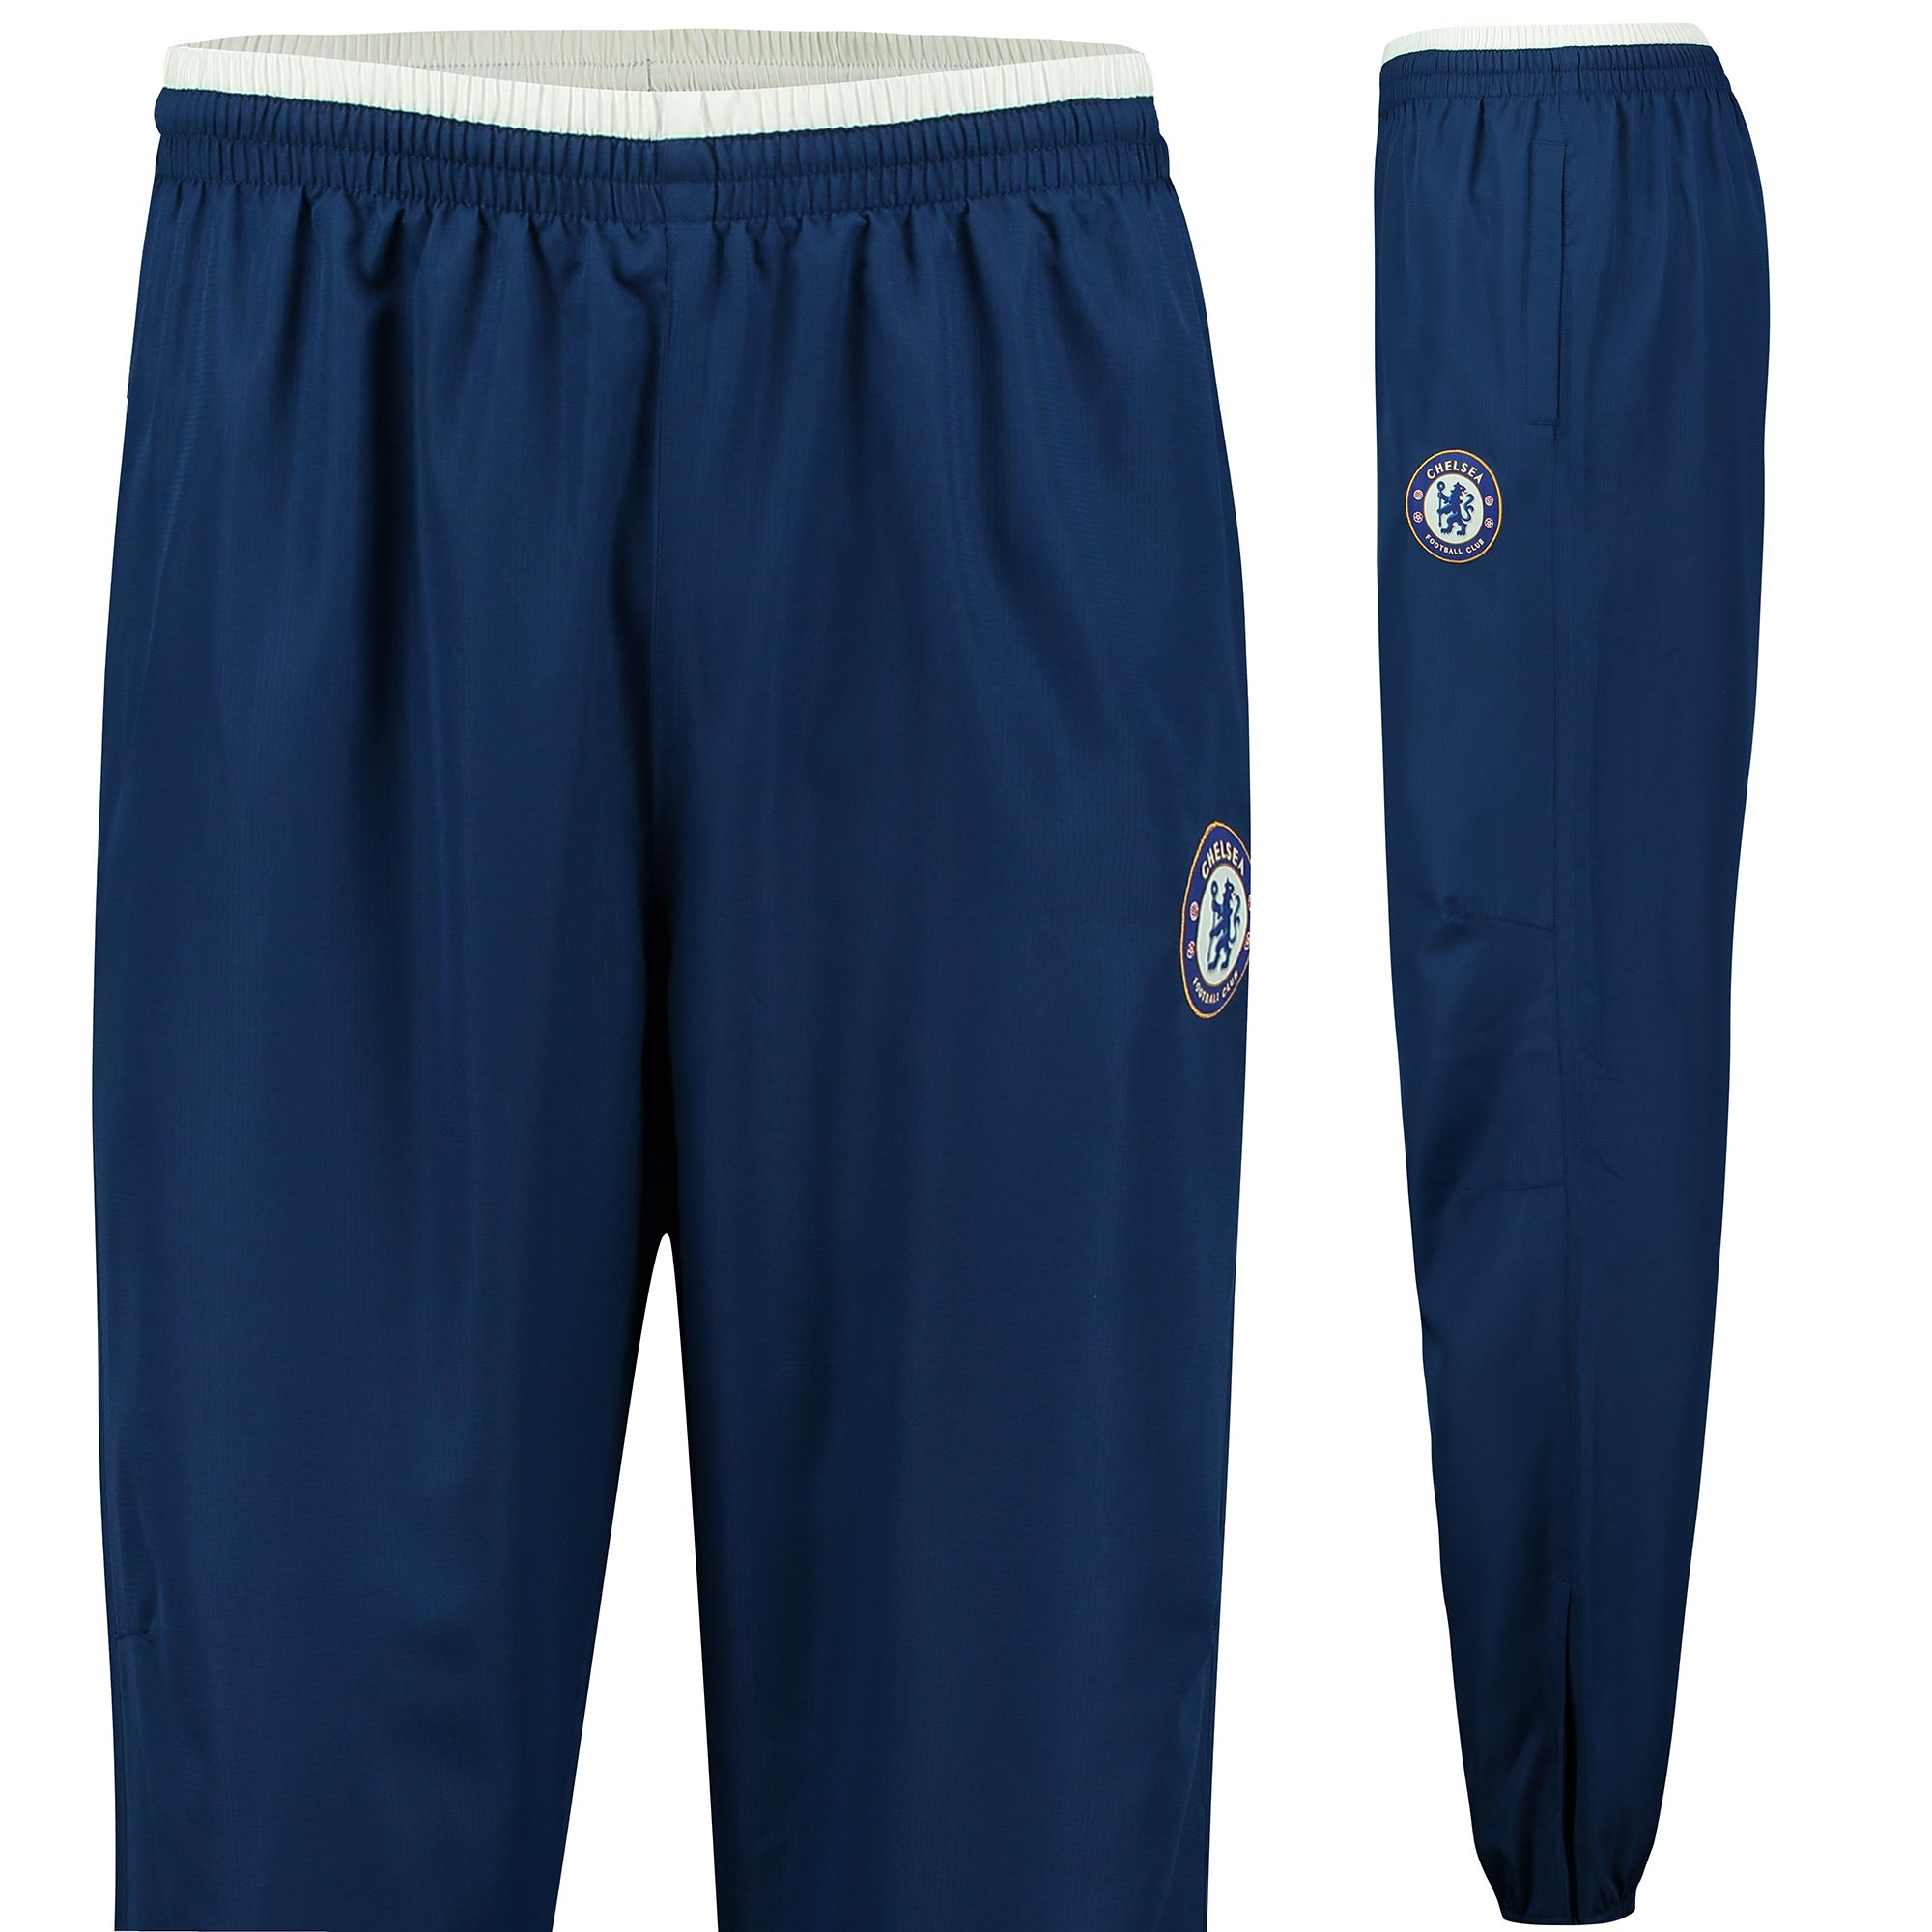 Chelsea Essential Woven Leisure Pant - Estate Blue - Mens